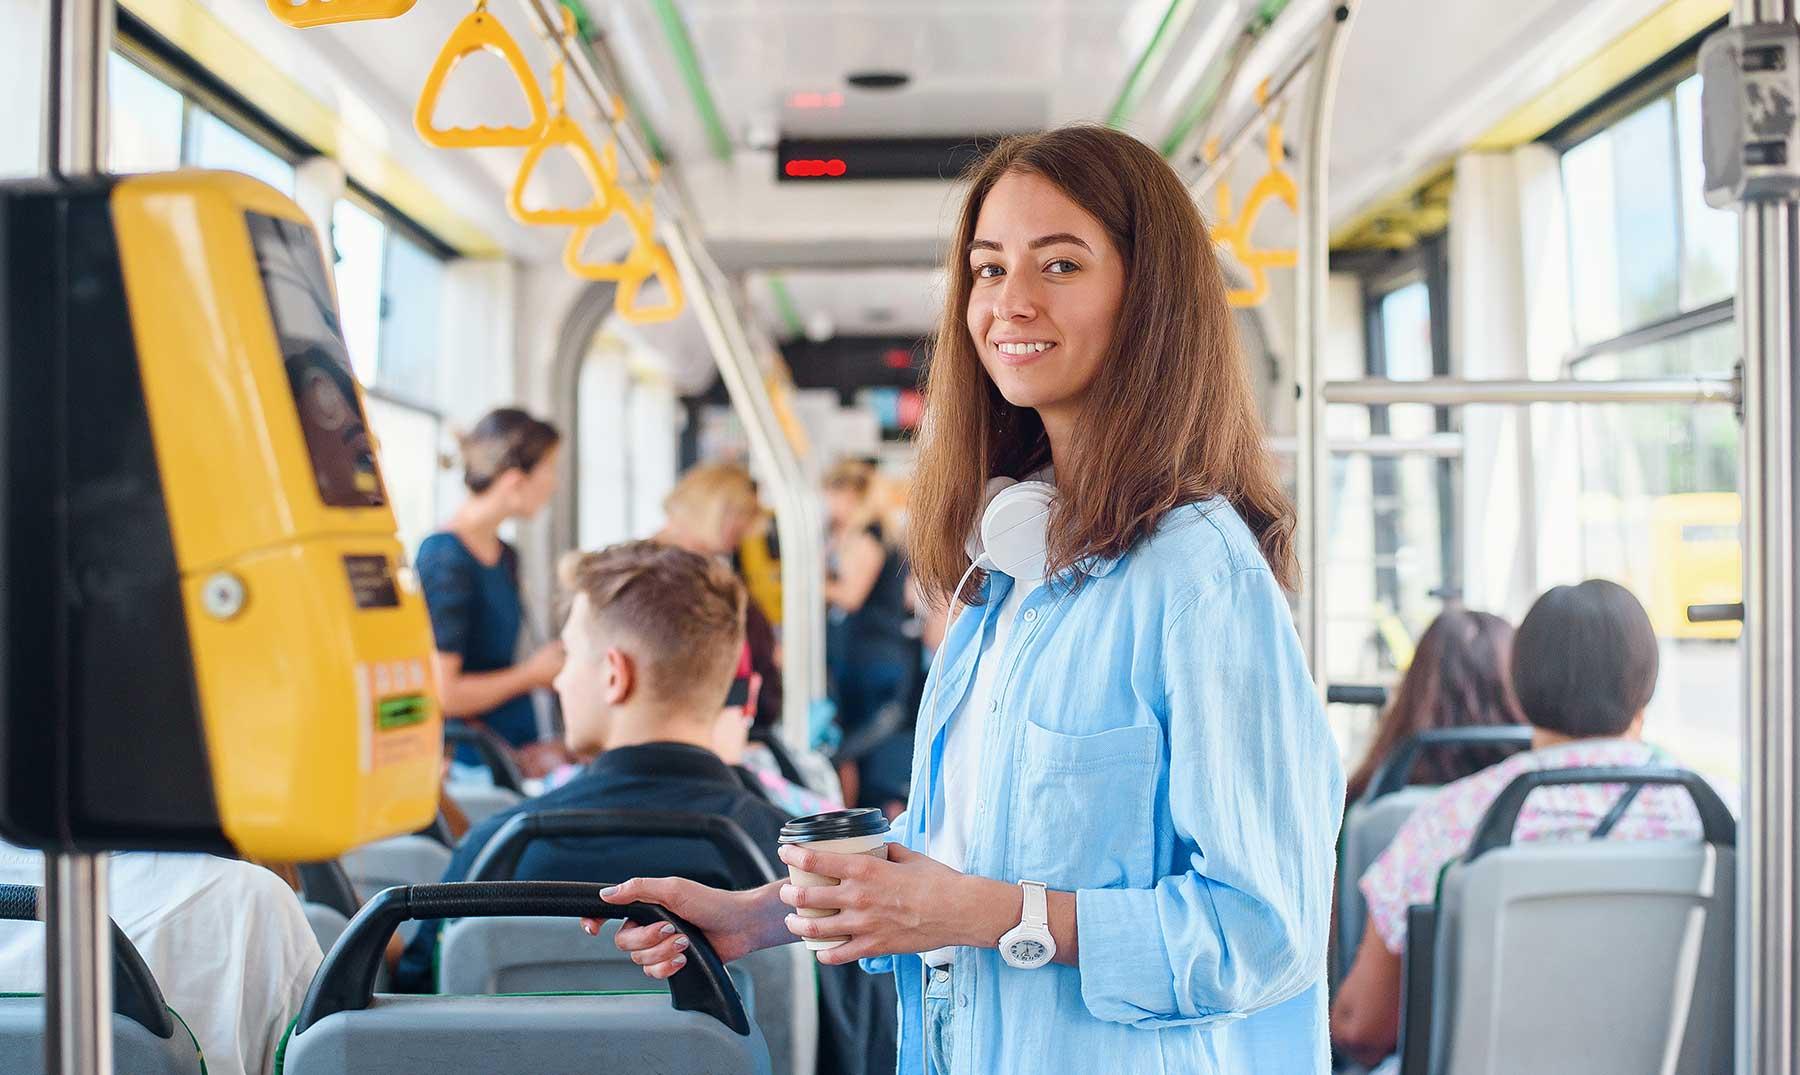 Transporte publico de barcelona